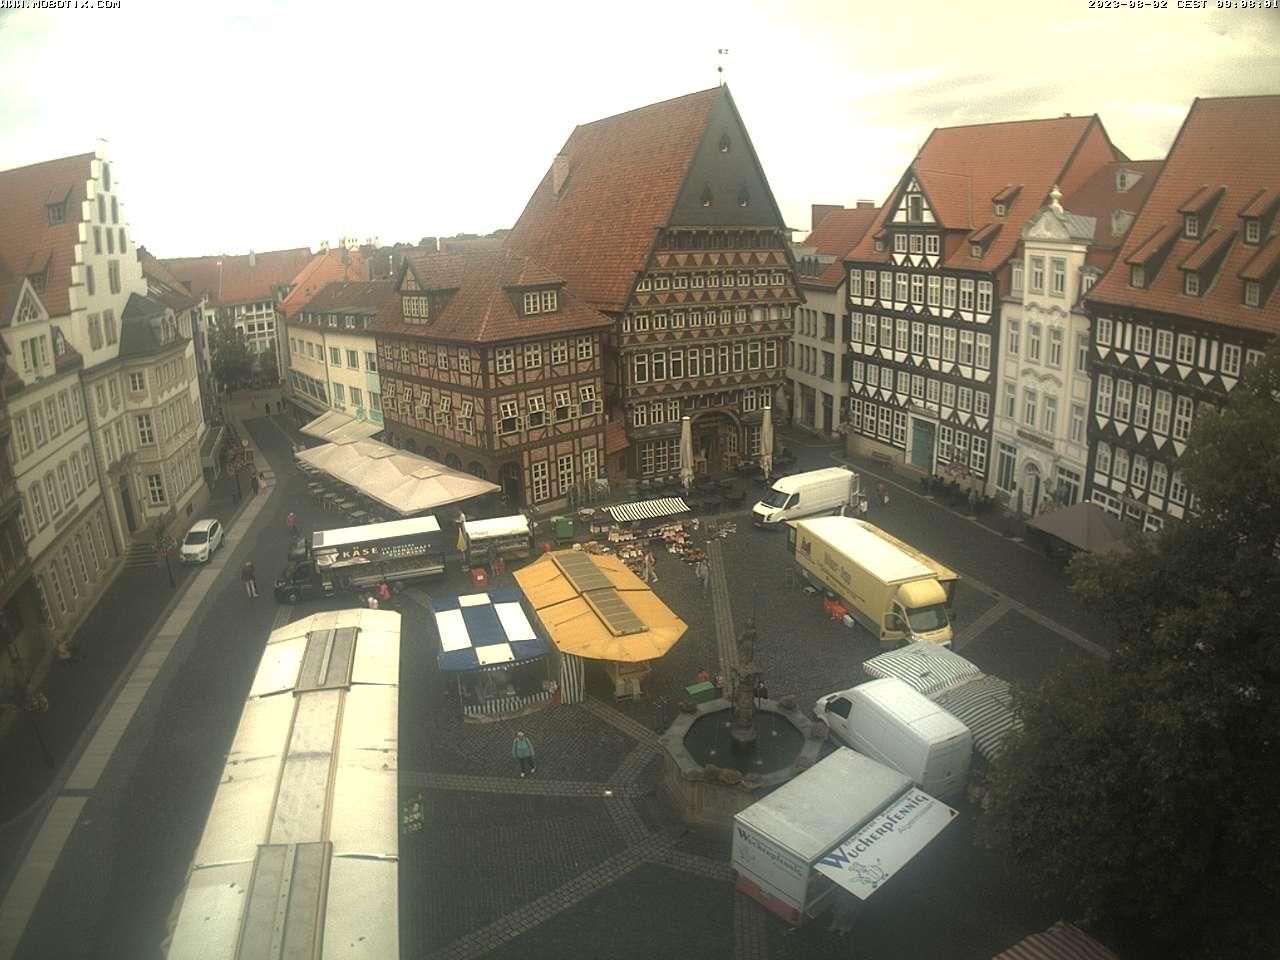 Hildesheim Tue. 09:10